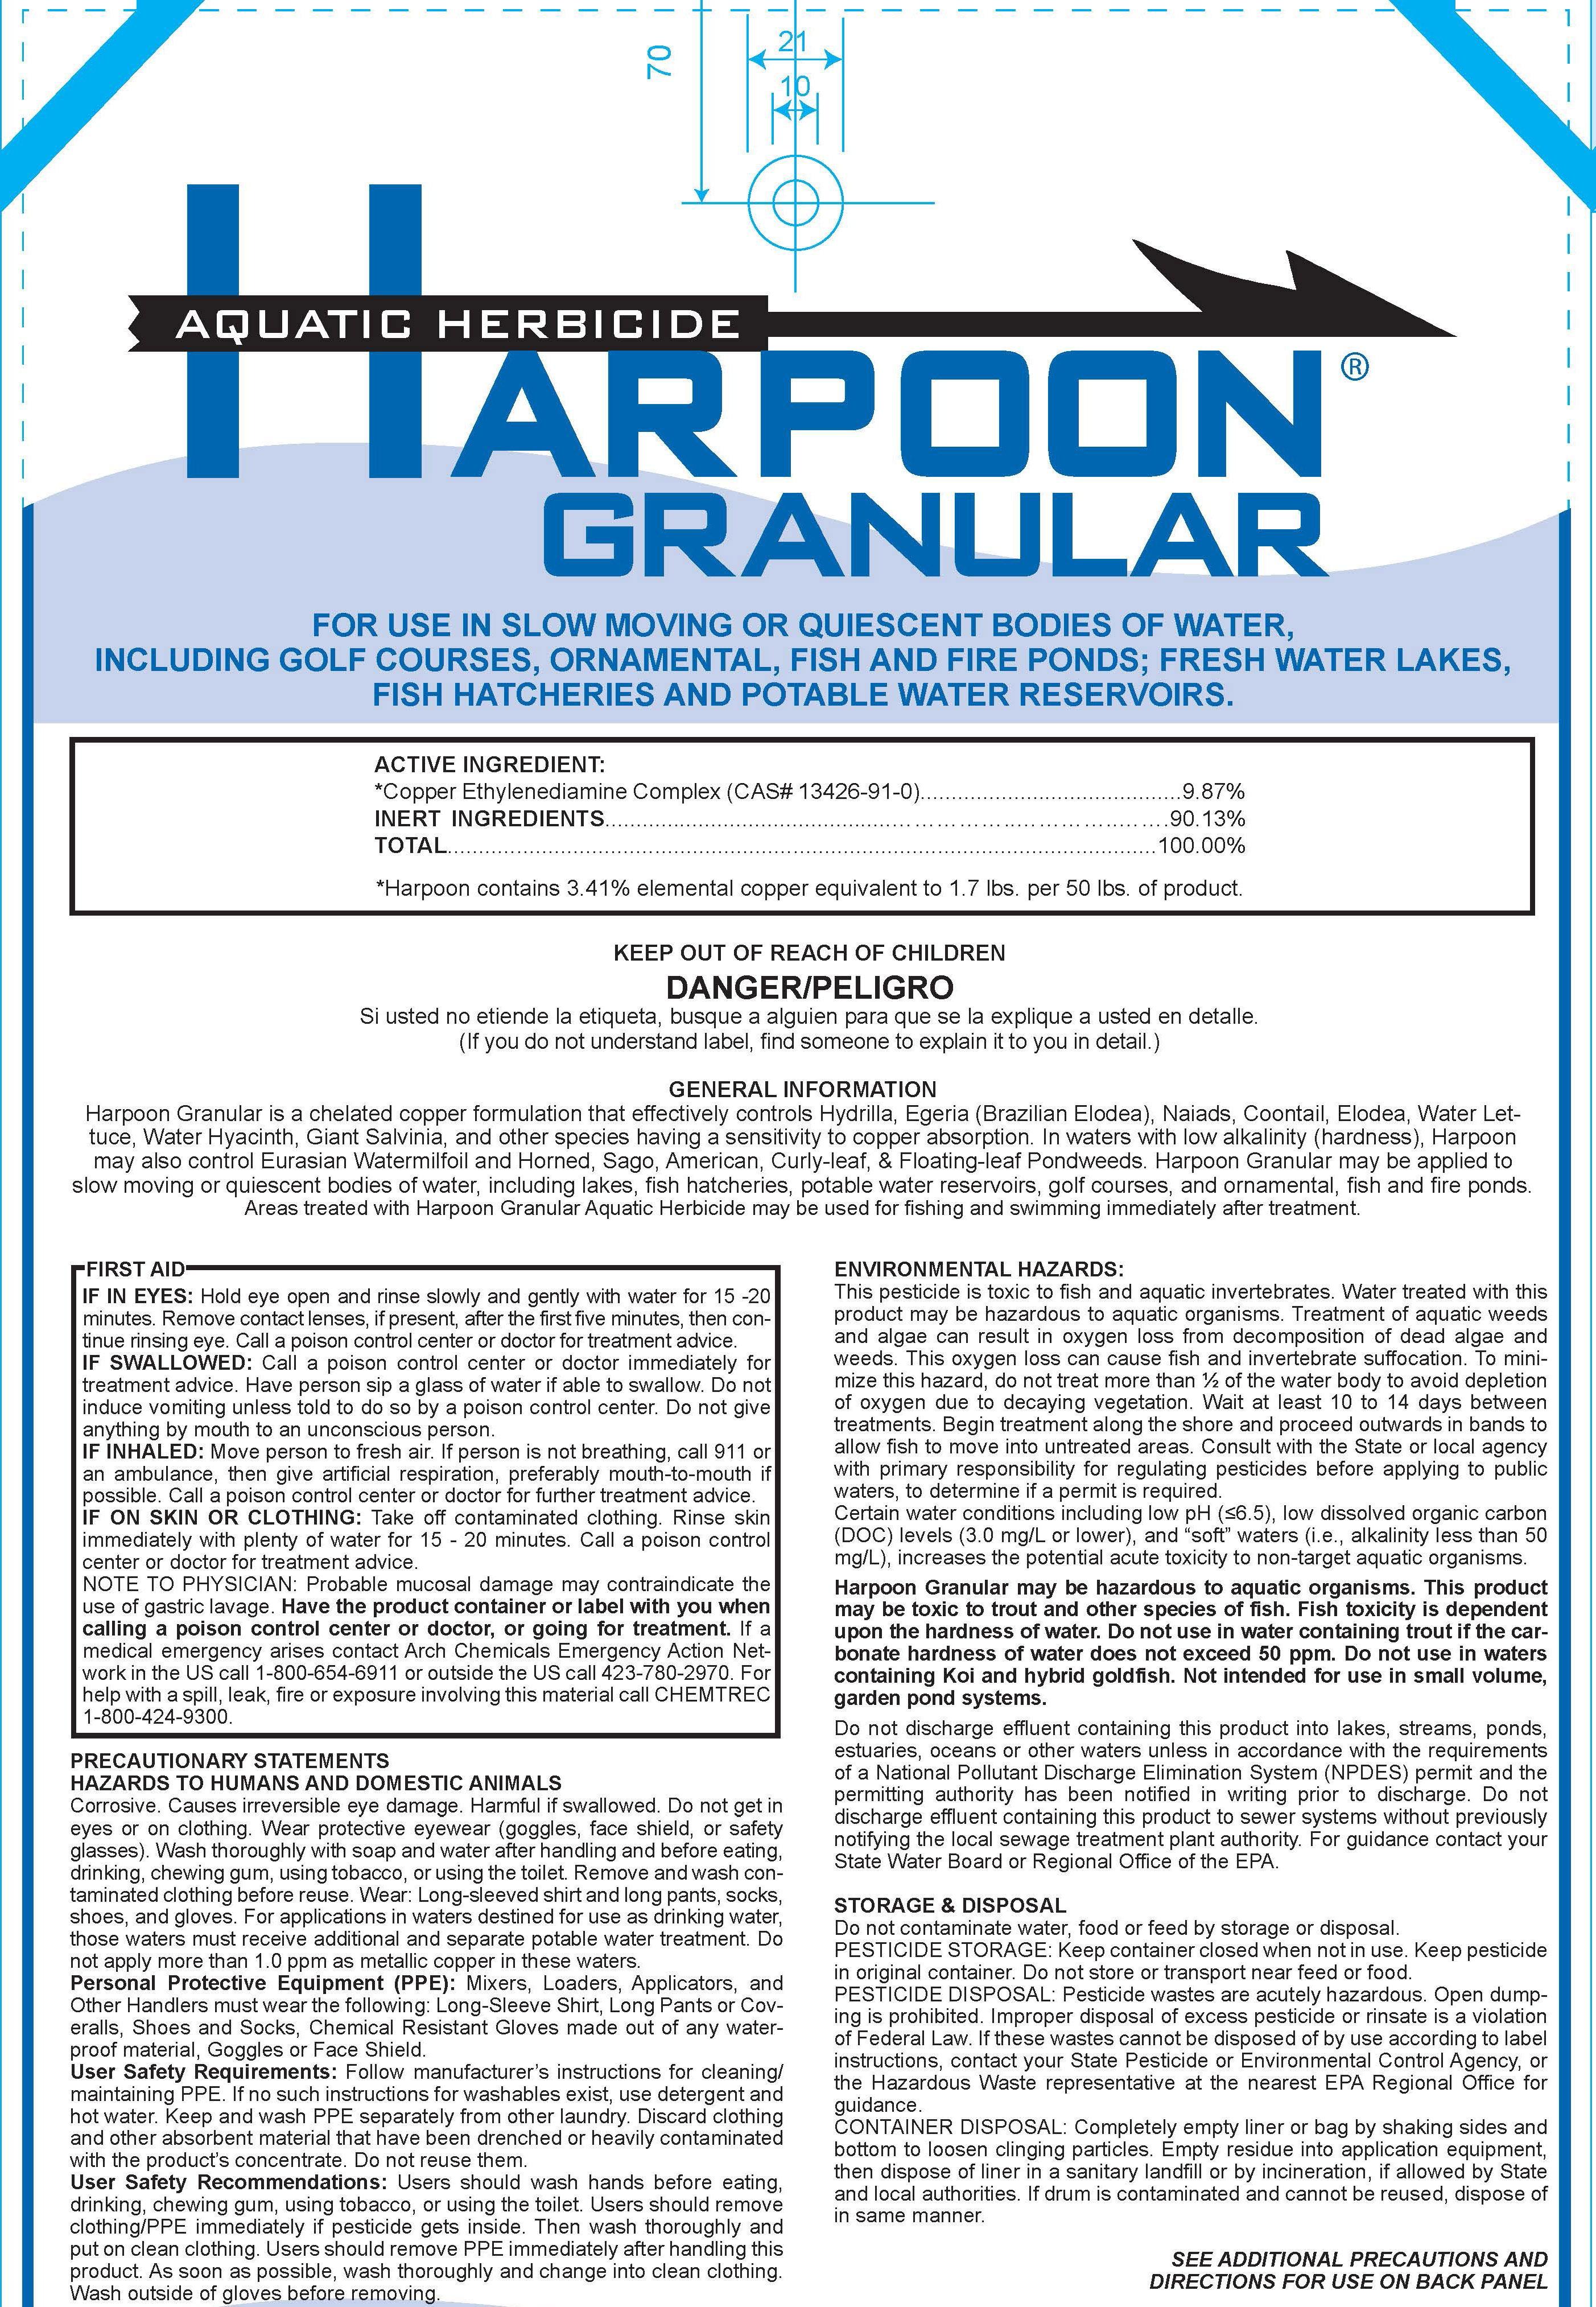 HarpoonGran_NYLabel_102711_c2-1.jpg